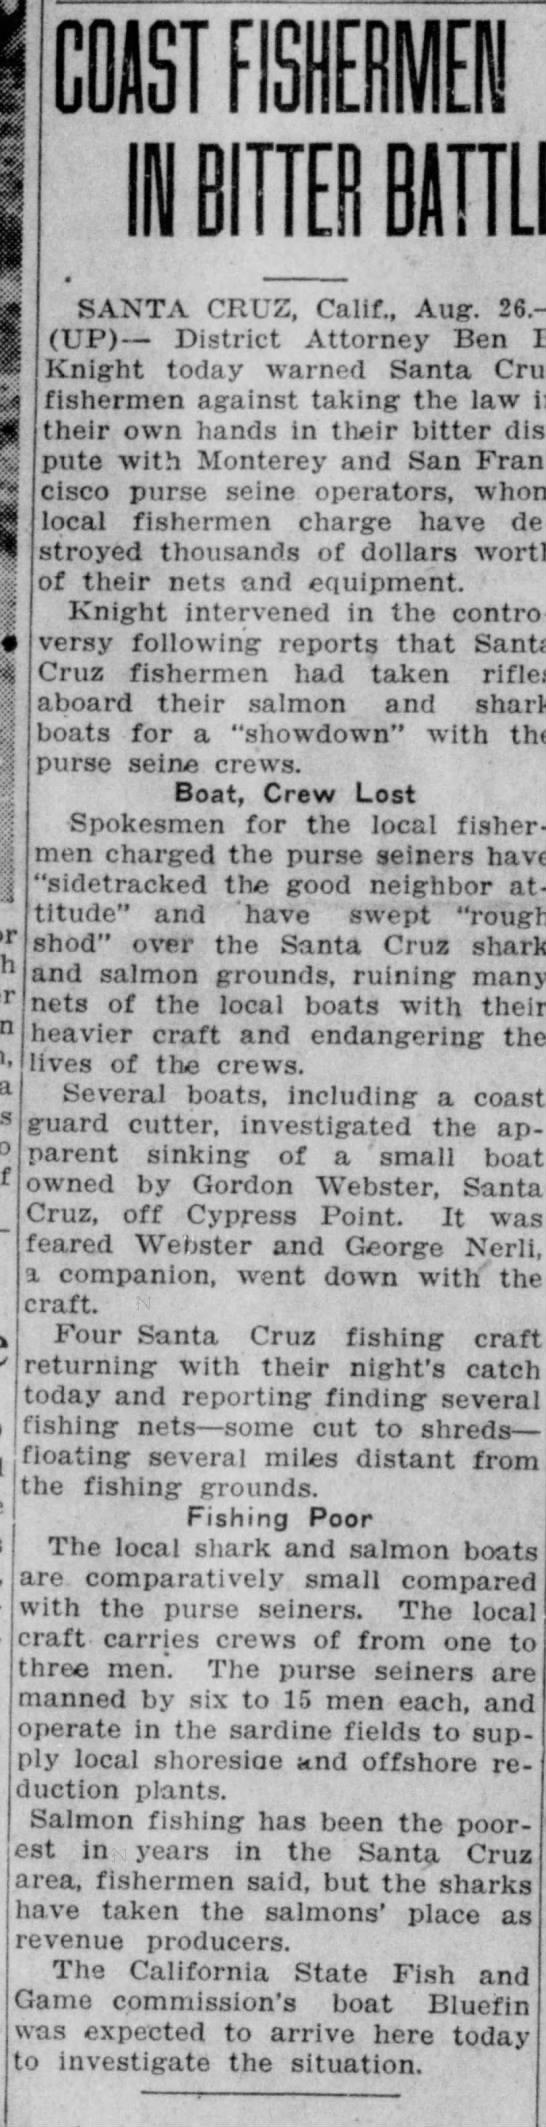 Webster, Gordon lost at sea - Article in Santa Ana Register 26 Aug 1938 -